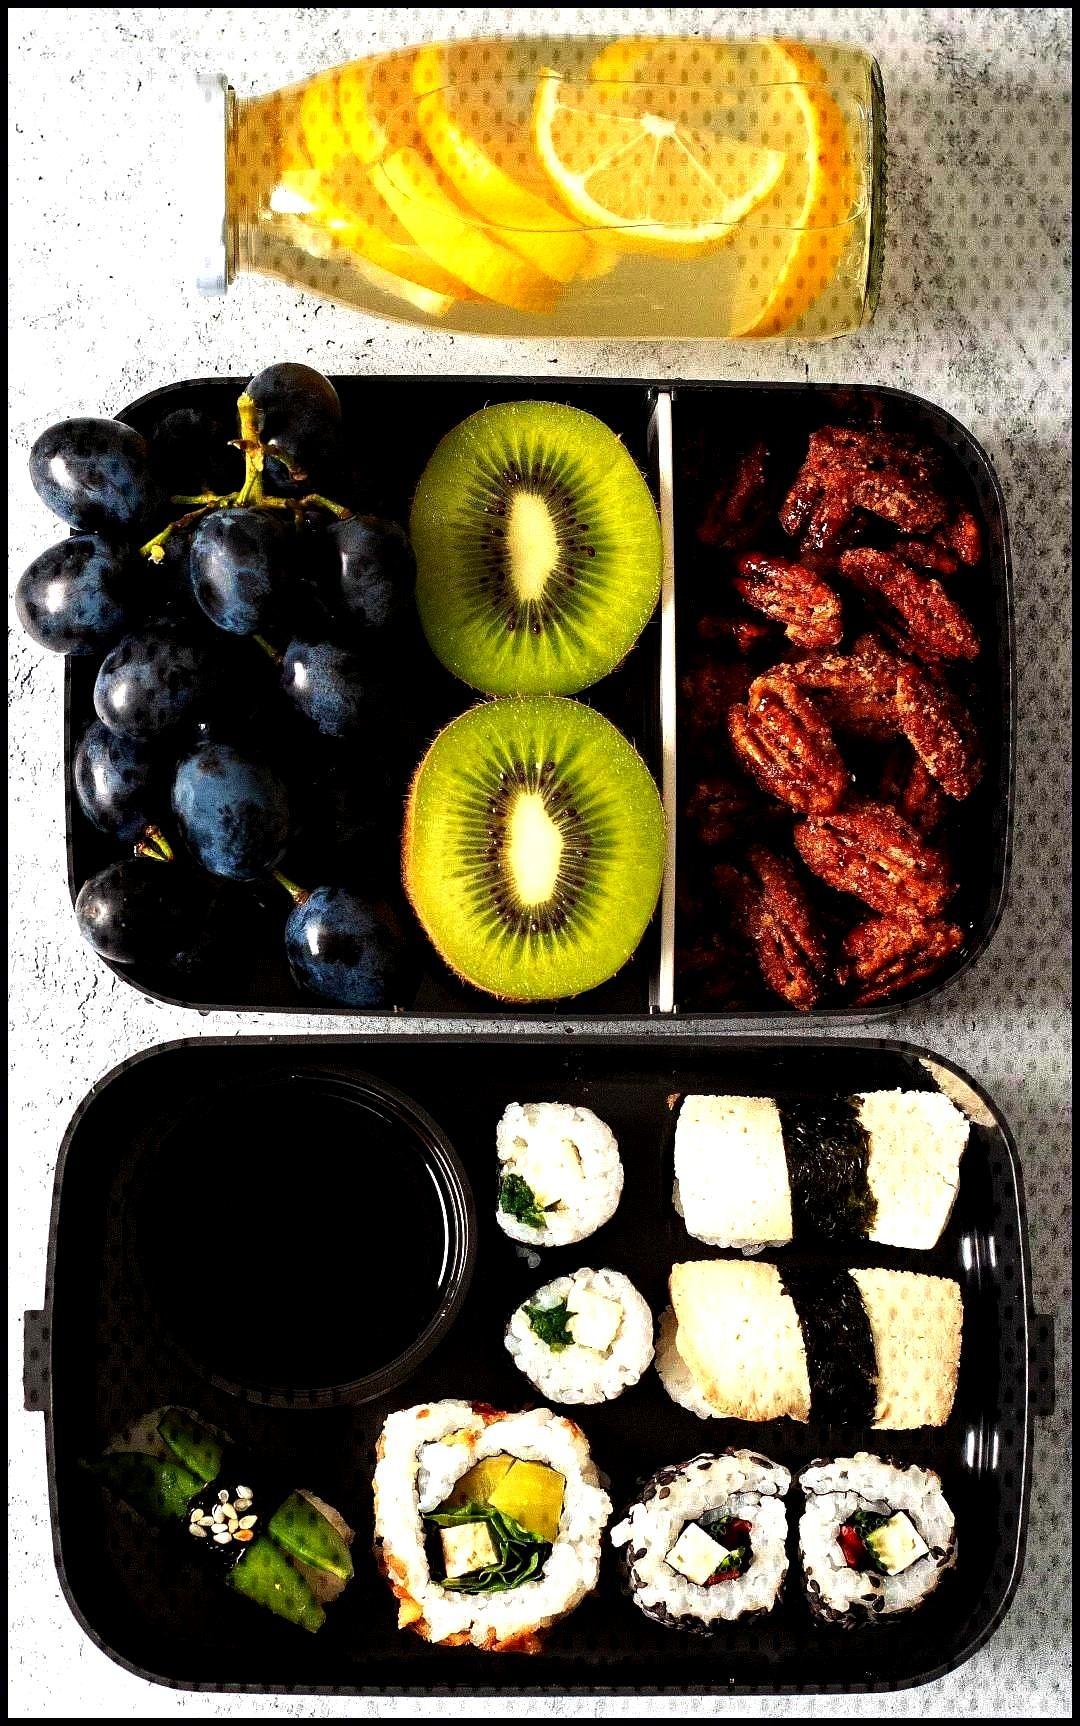 NoHeat Vegan School Lunch Ideas For College Vegan school lunch Vegan school lunch Workout food Vega